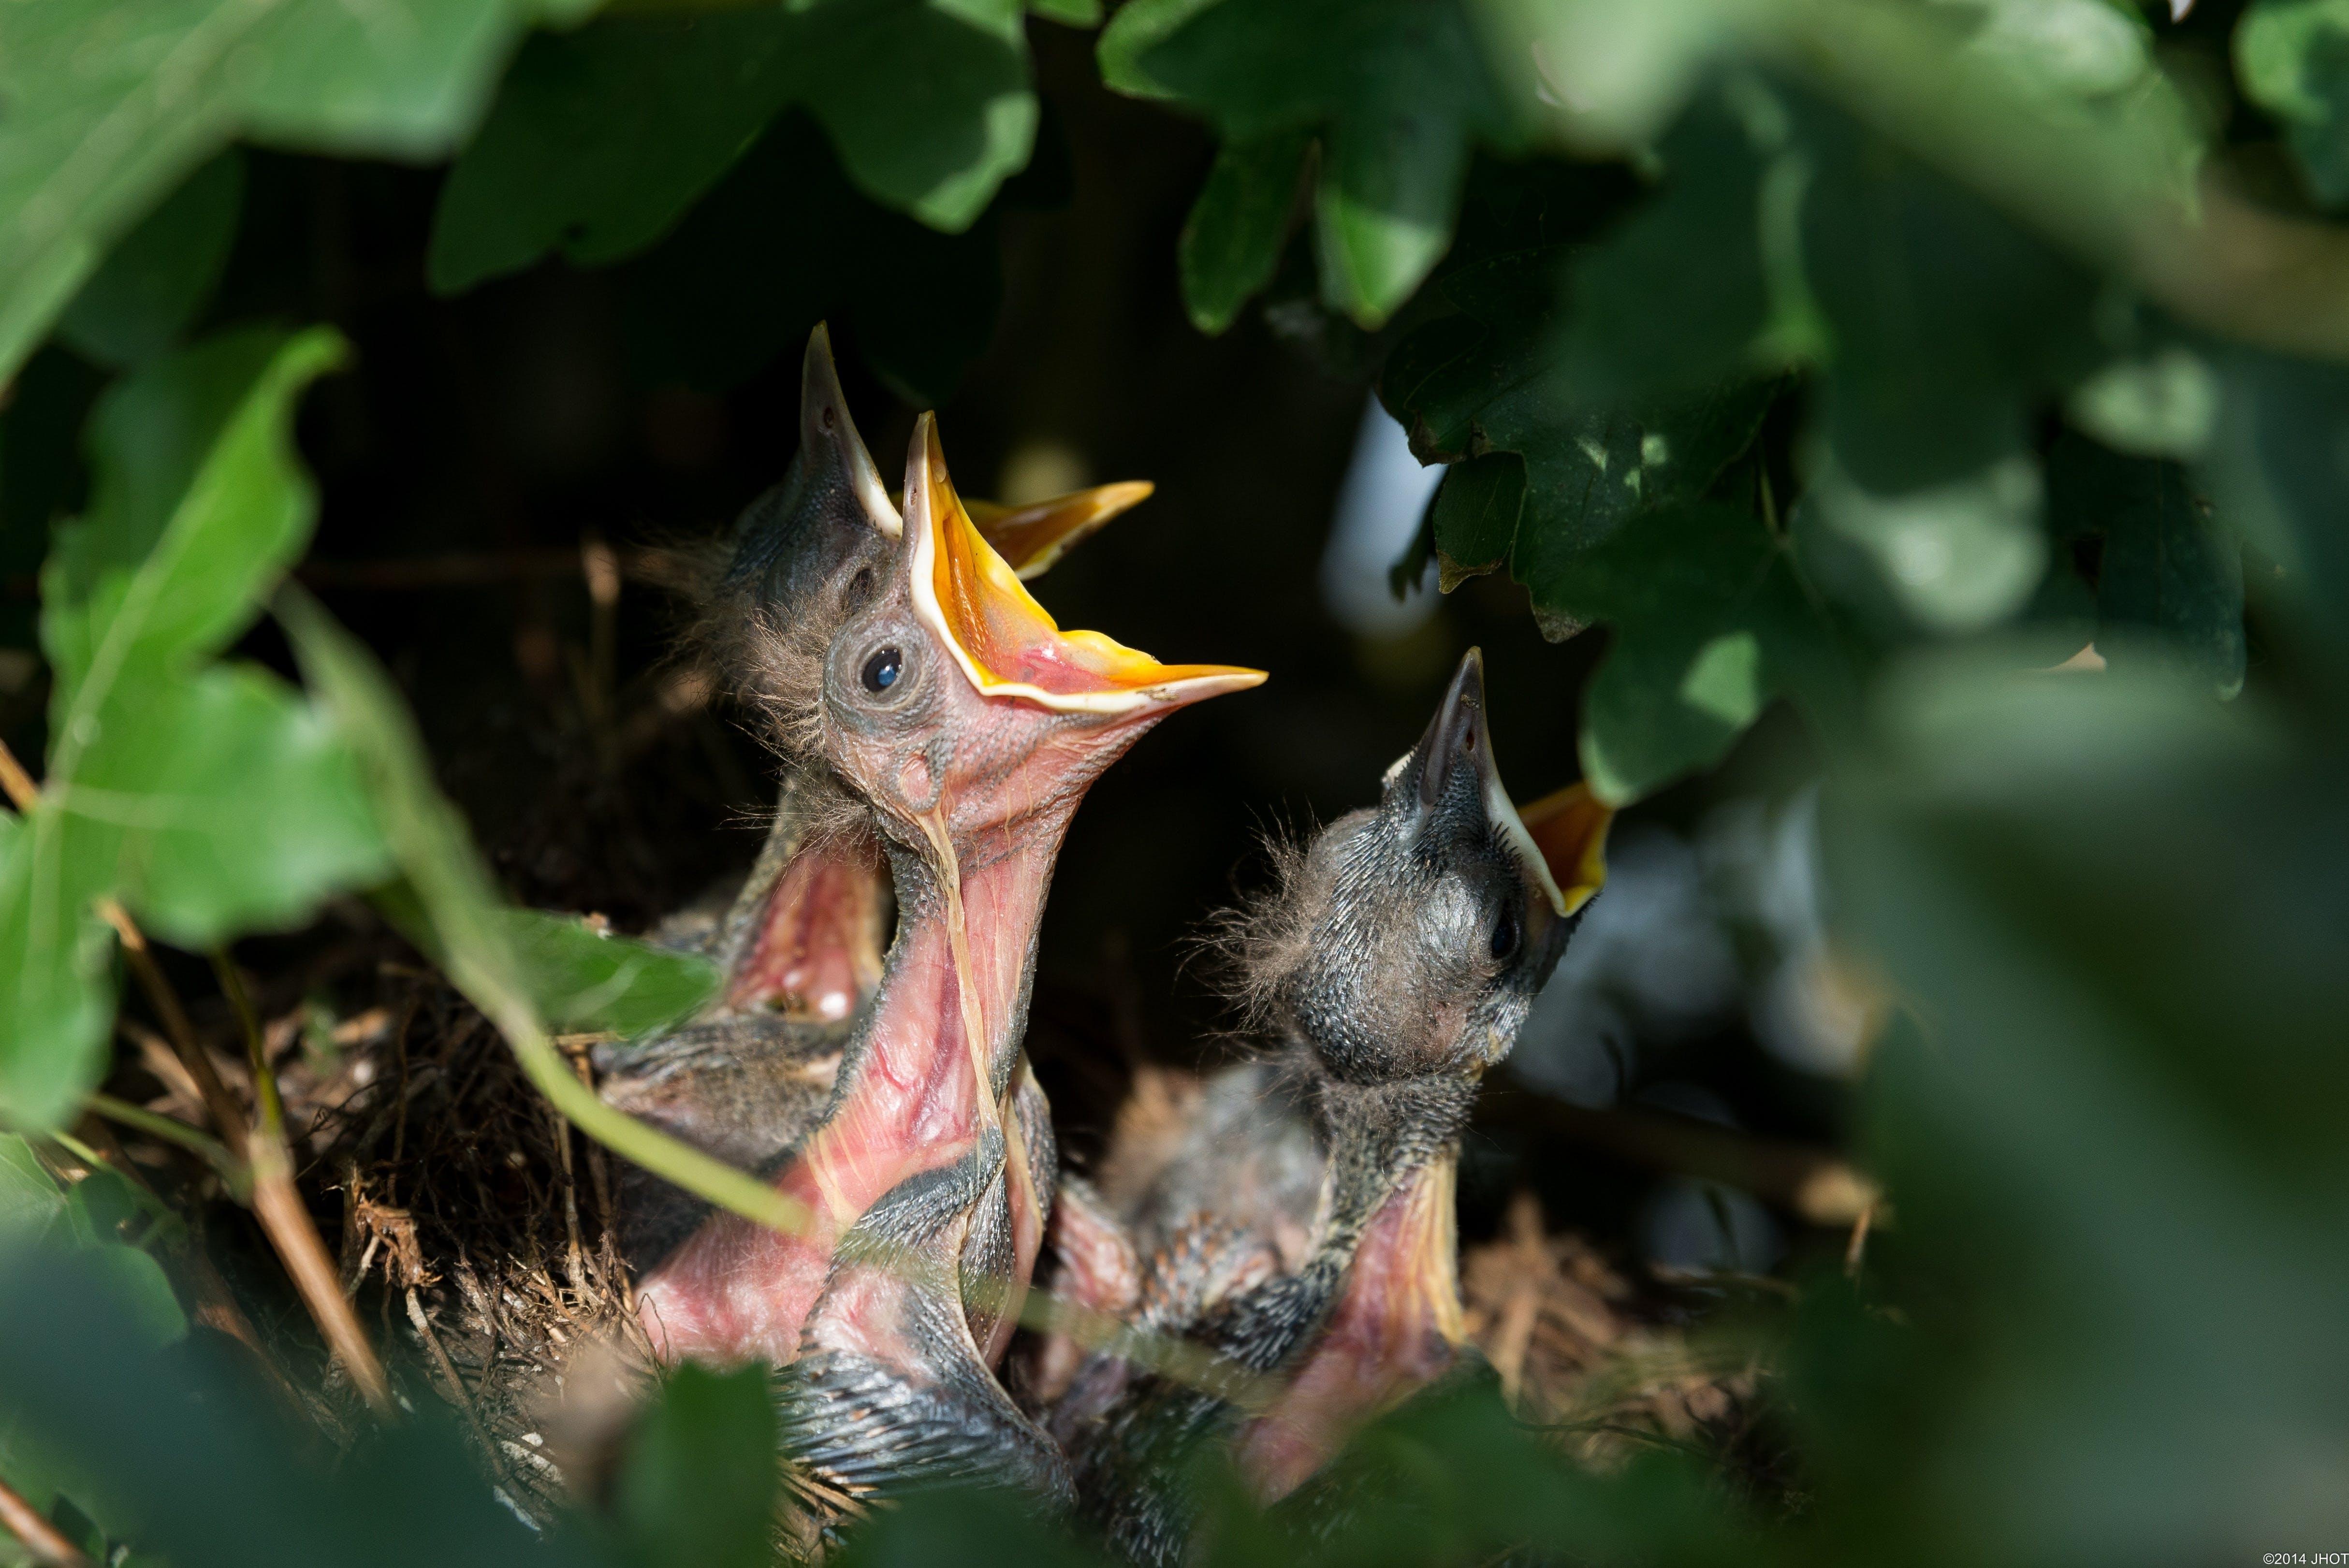 Bird Chicks Opening Mouth